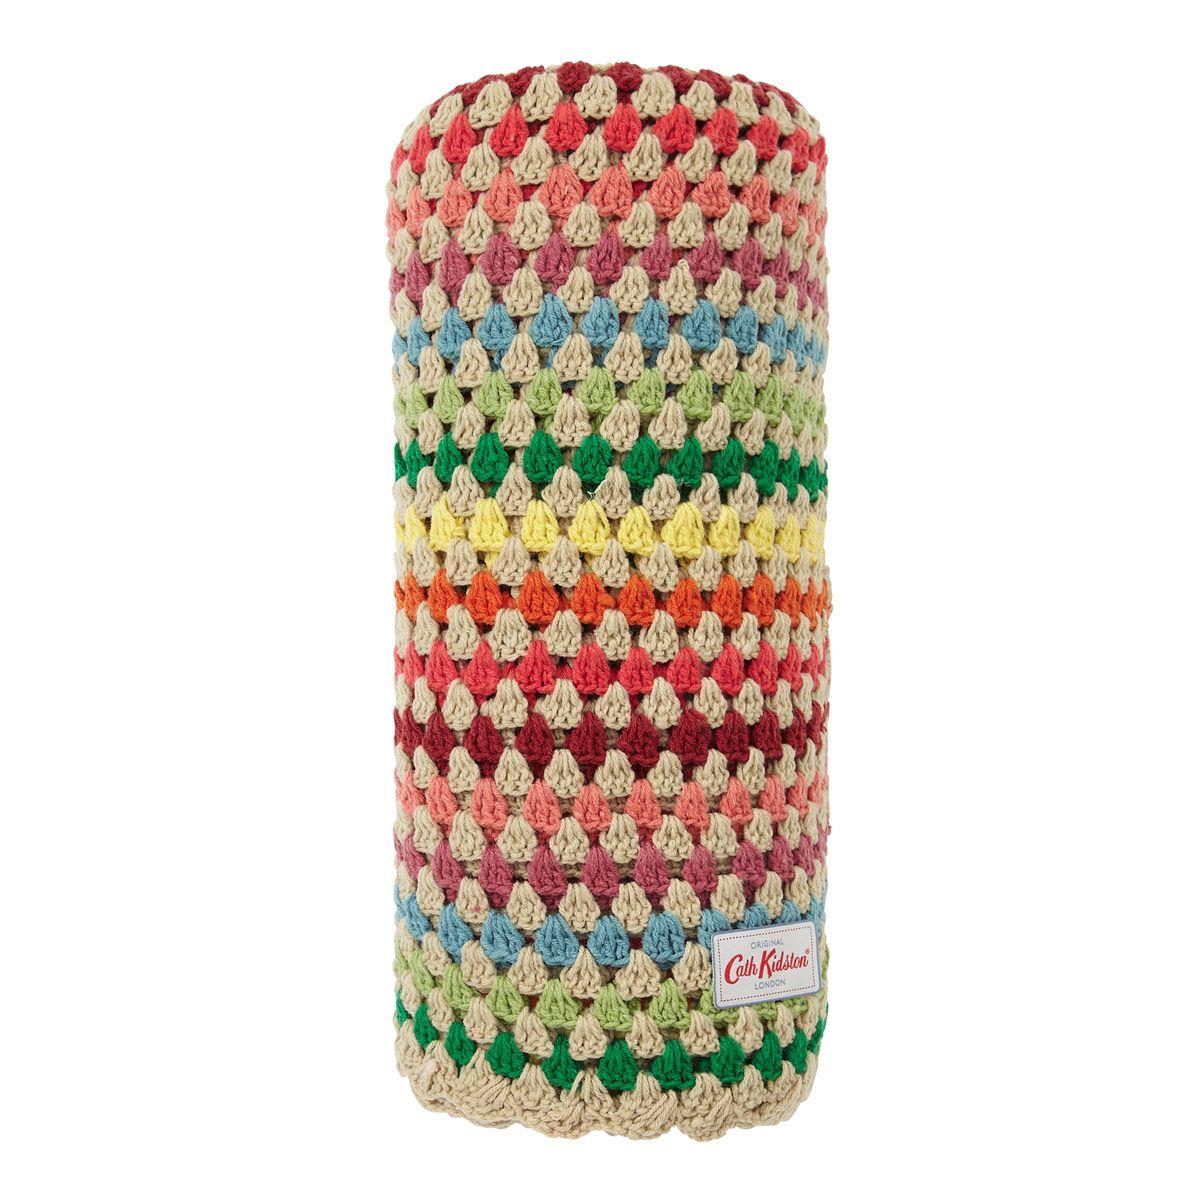 New Home | Stripe Crochet Throw | CathKidston